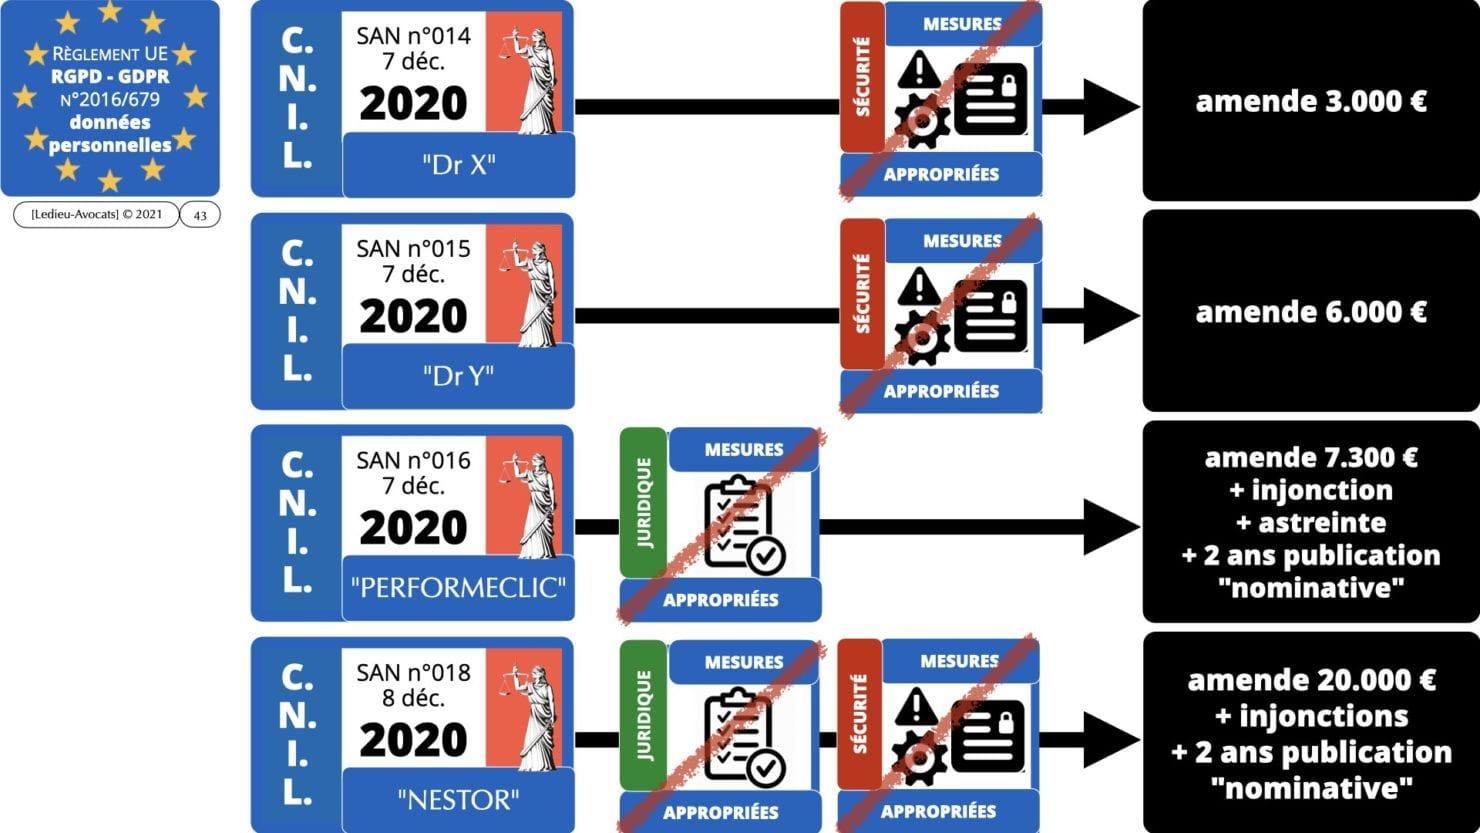 RGPD e-Privacy principes actualité jurisprudence ©Ledieu-Avocats 25-06-2021.043